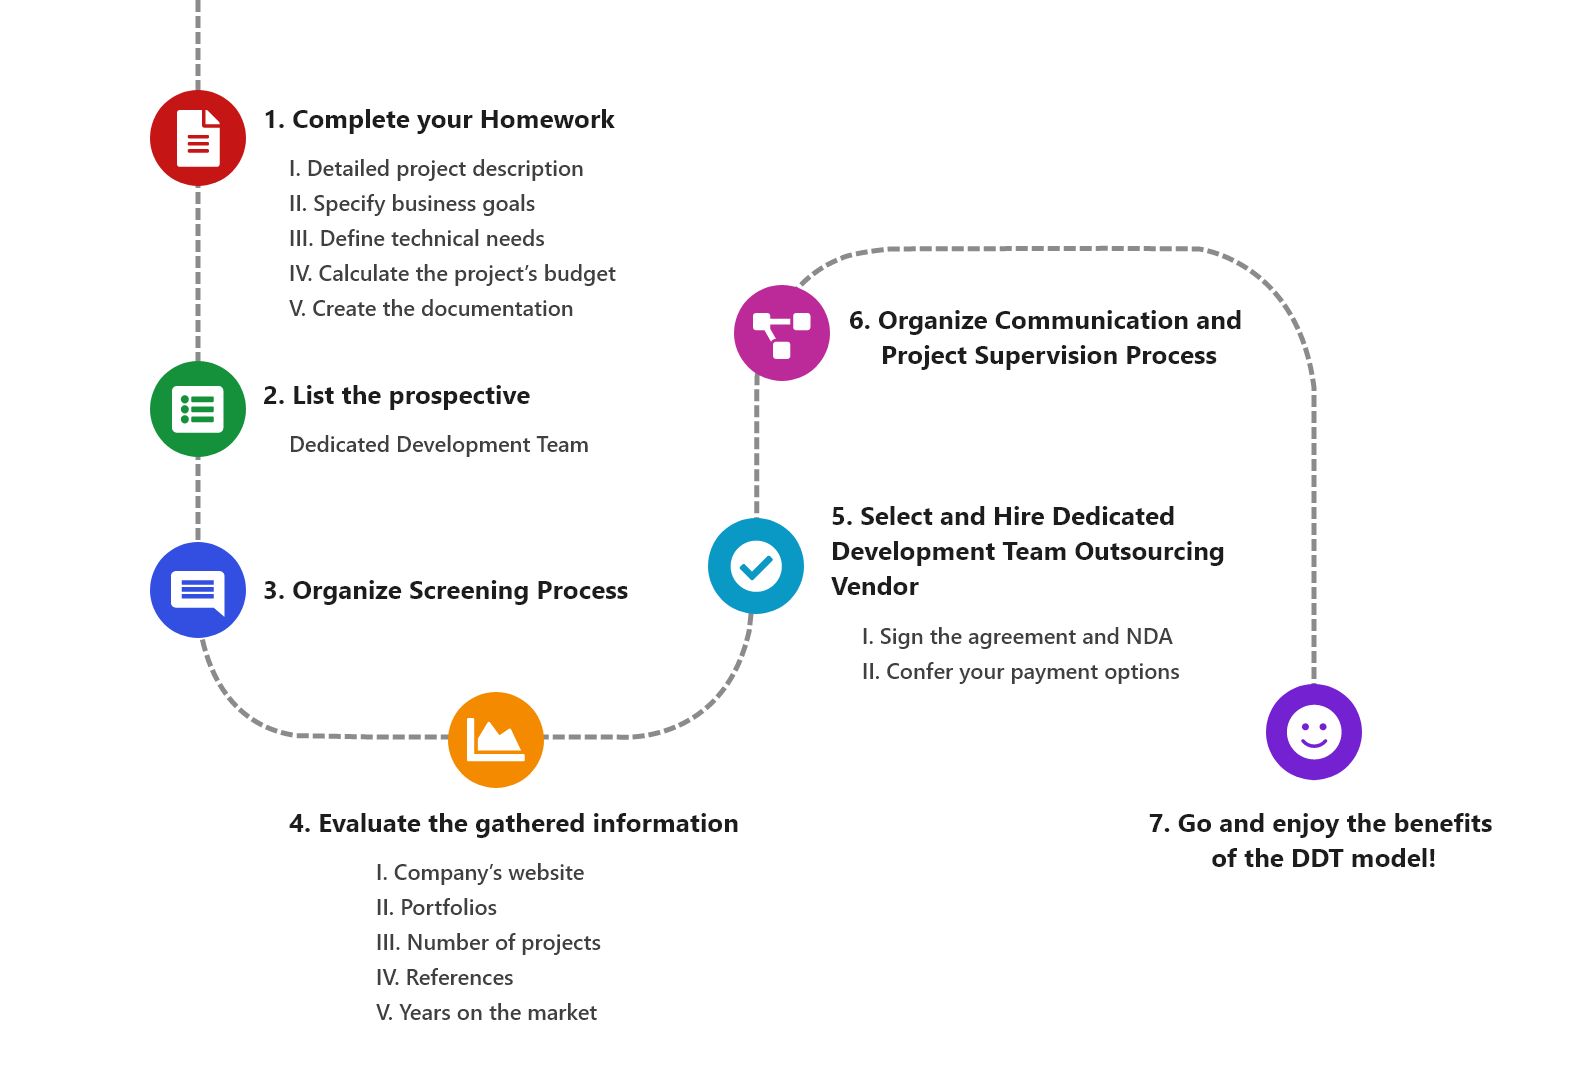 Process of dedicated team